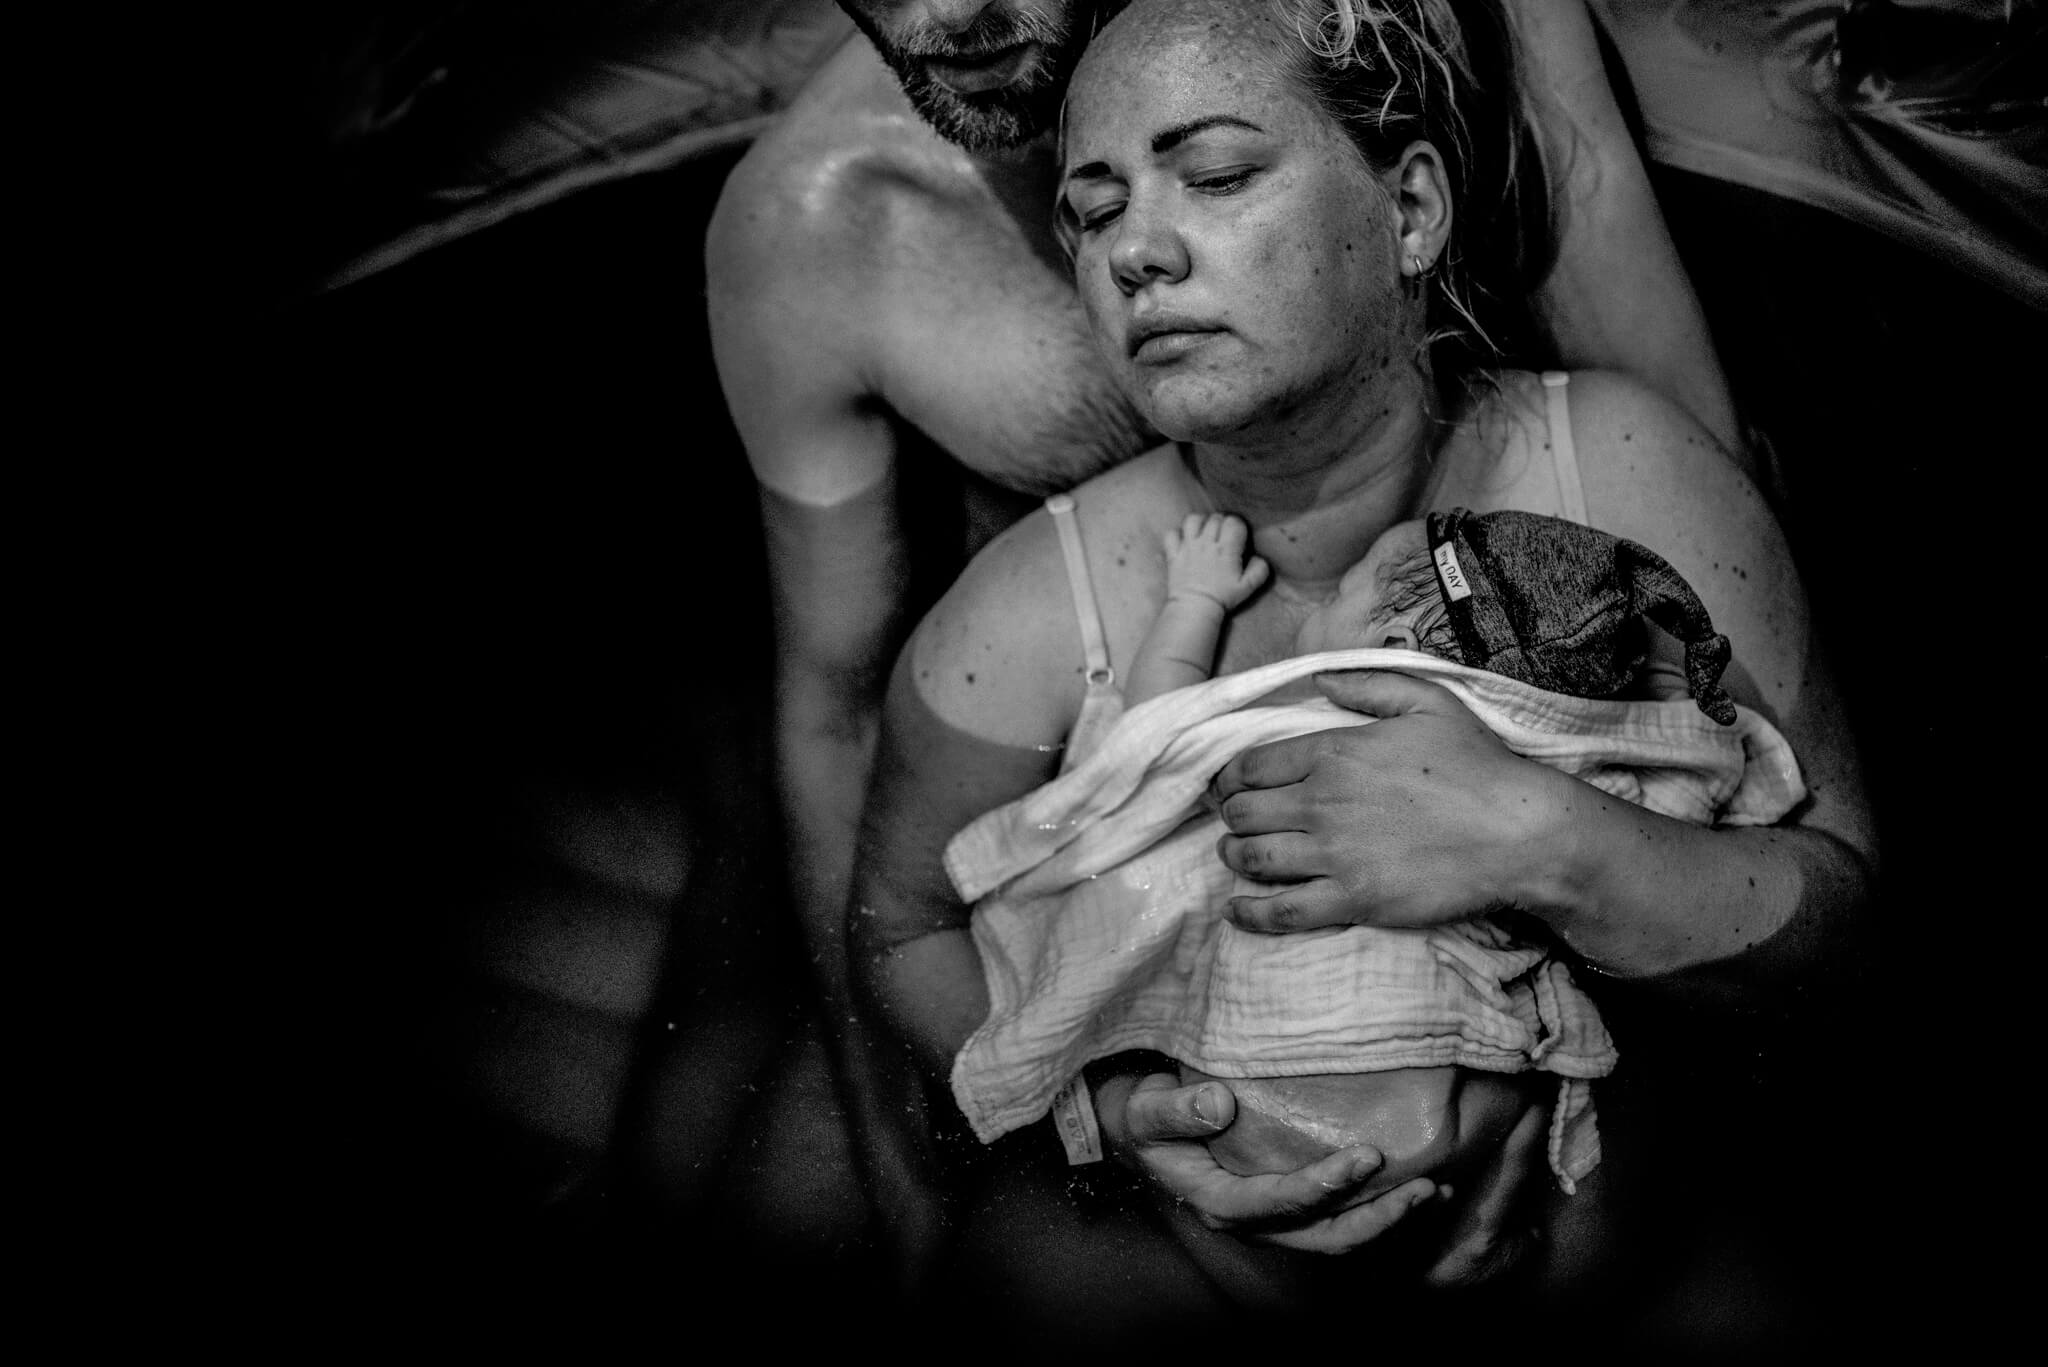 geboortefotografie Arnhem badbevalling Birth Day geboortefotografie